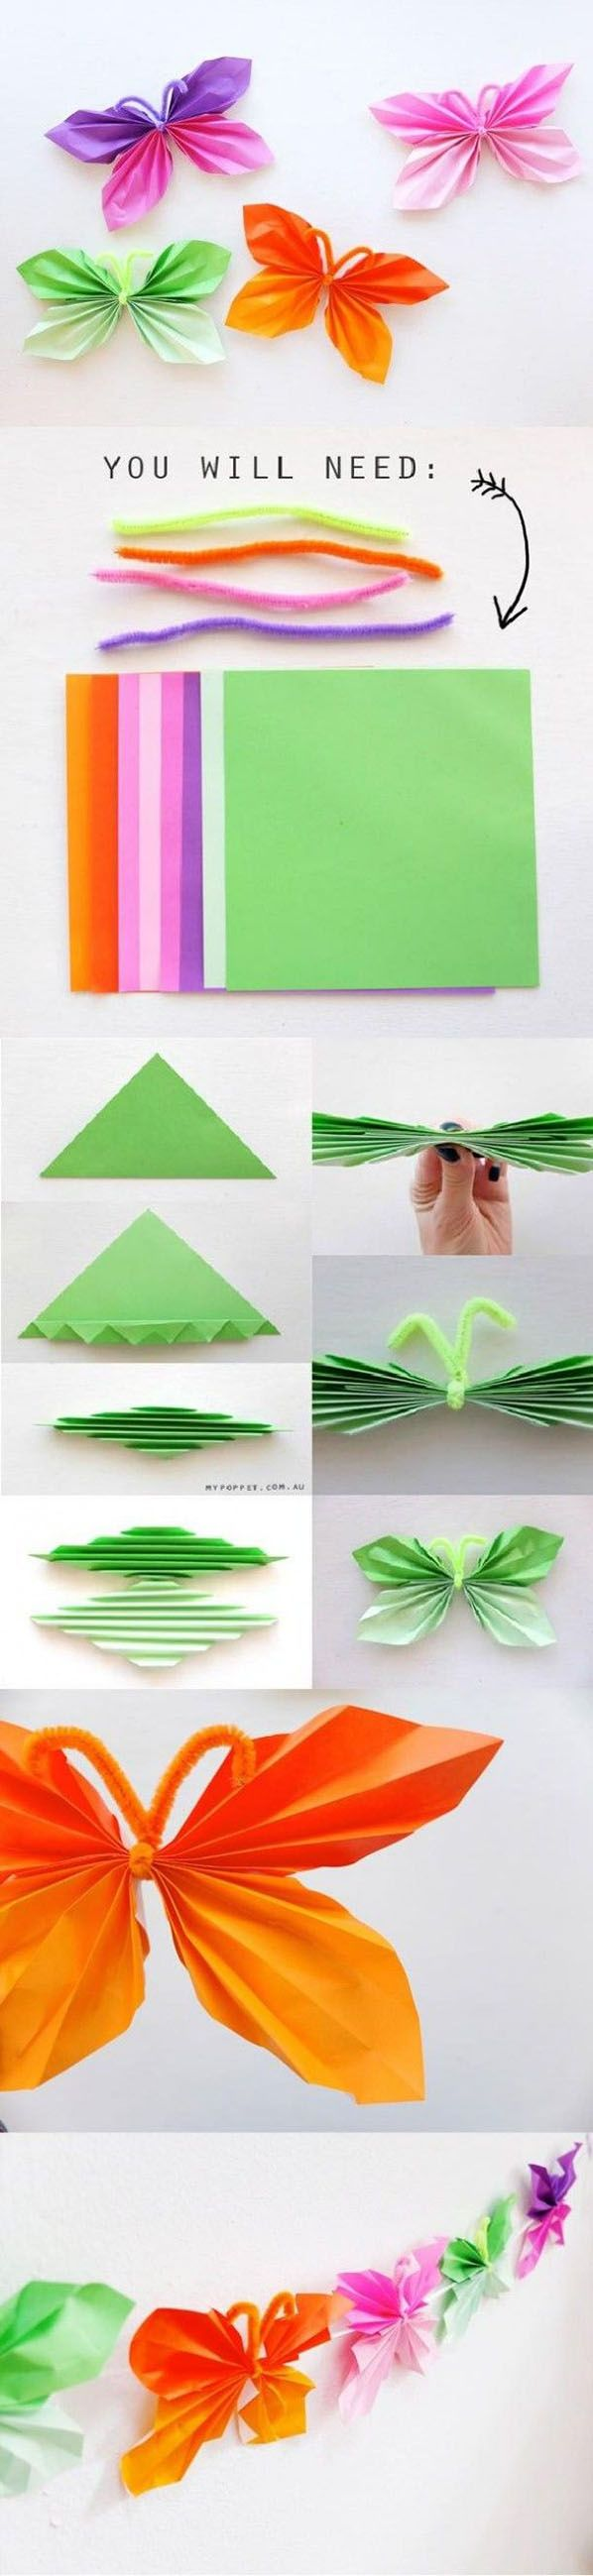 Diy Colorful Butterfly | DIY & Crafts Tutorials